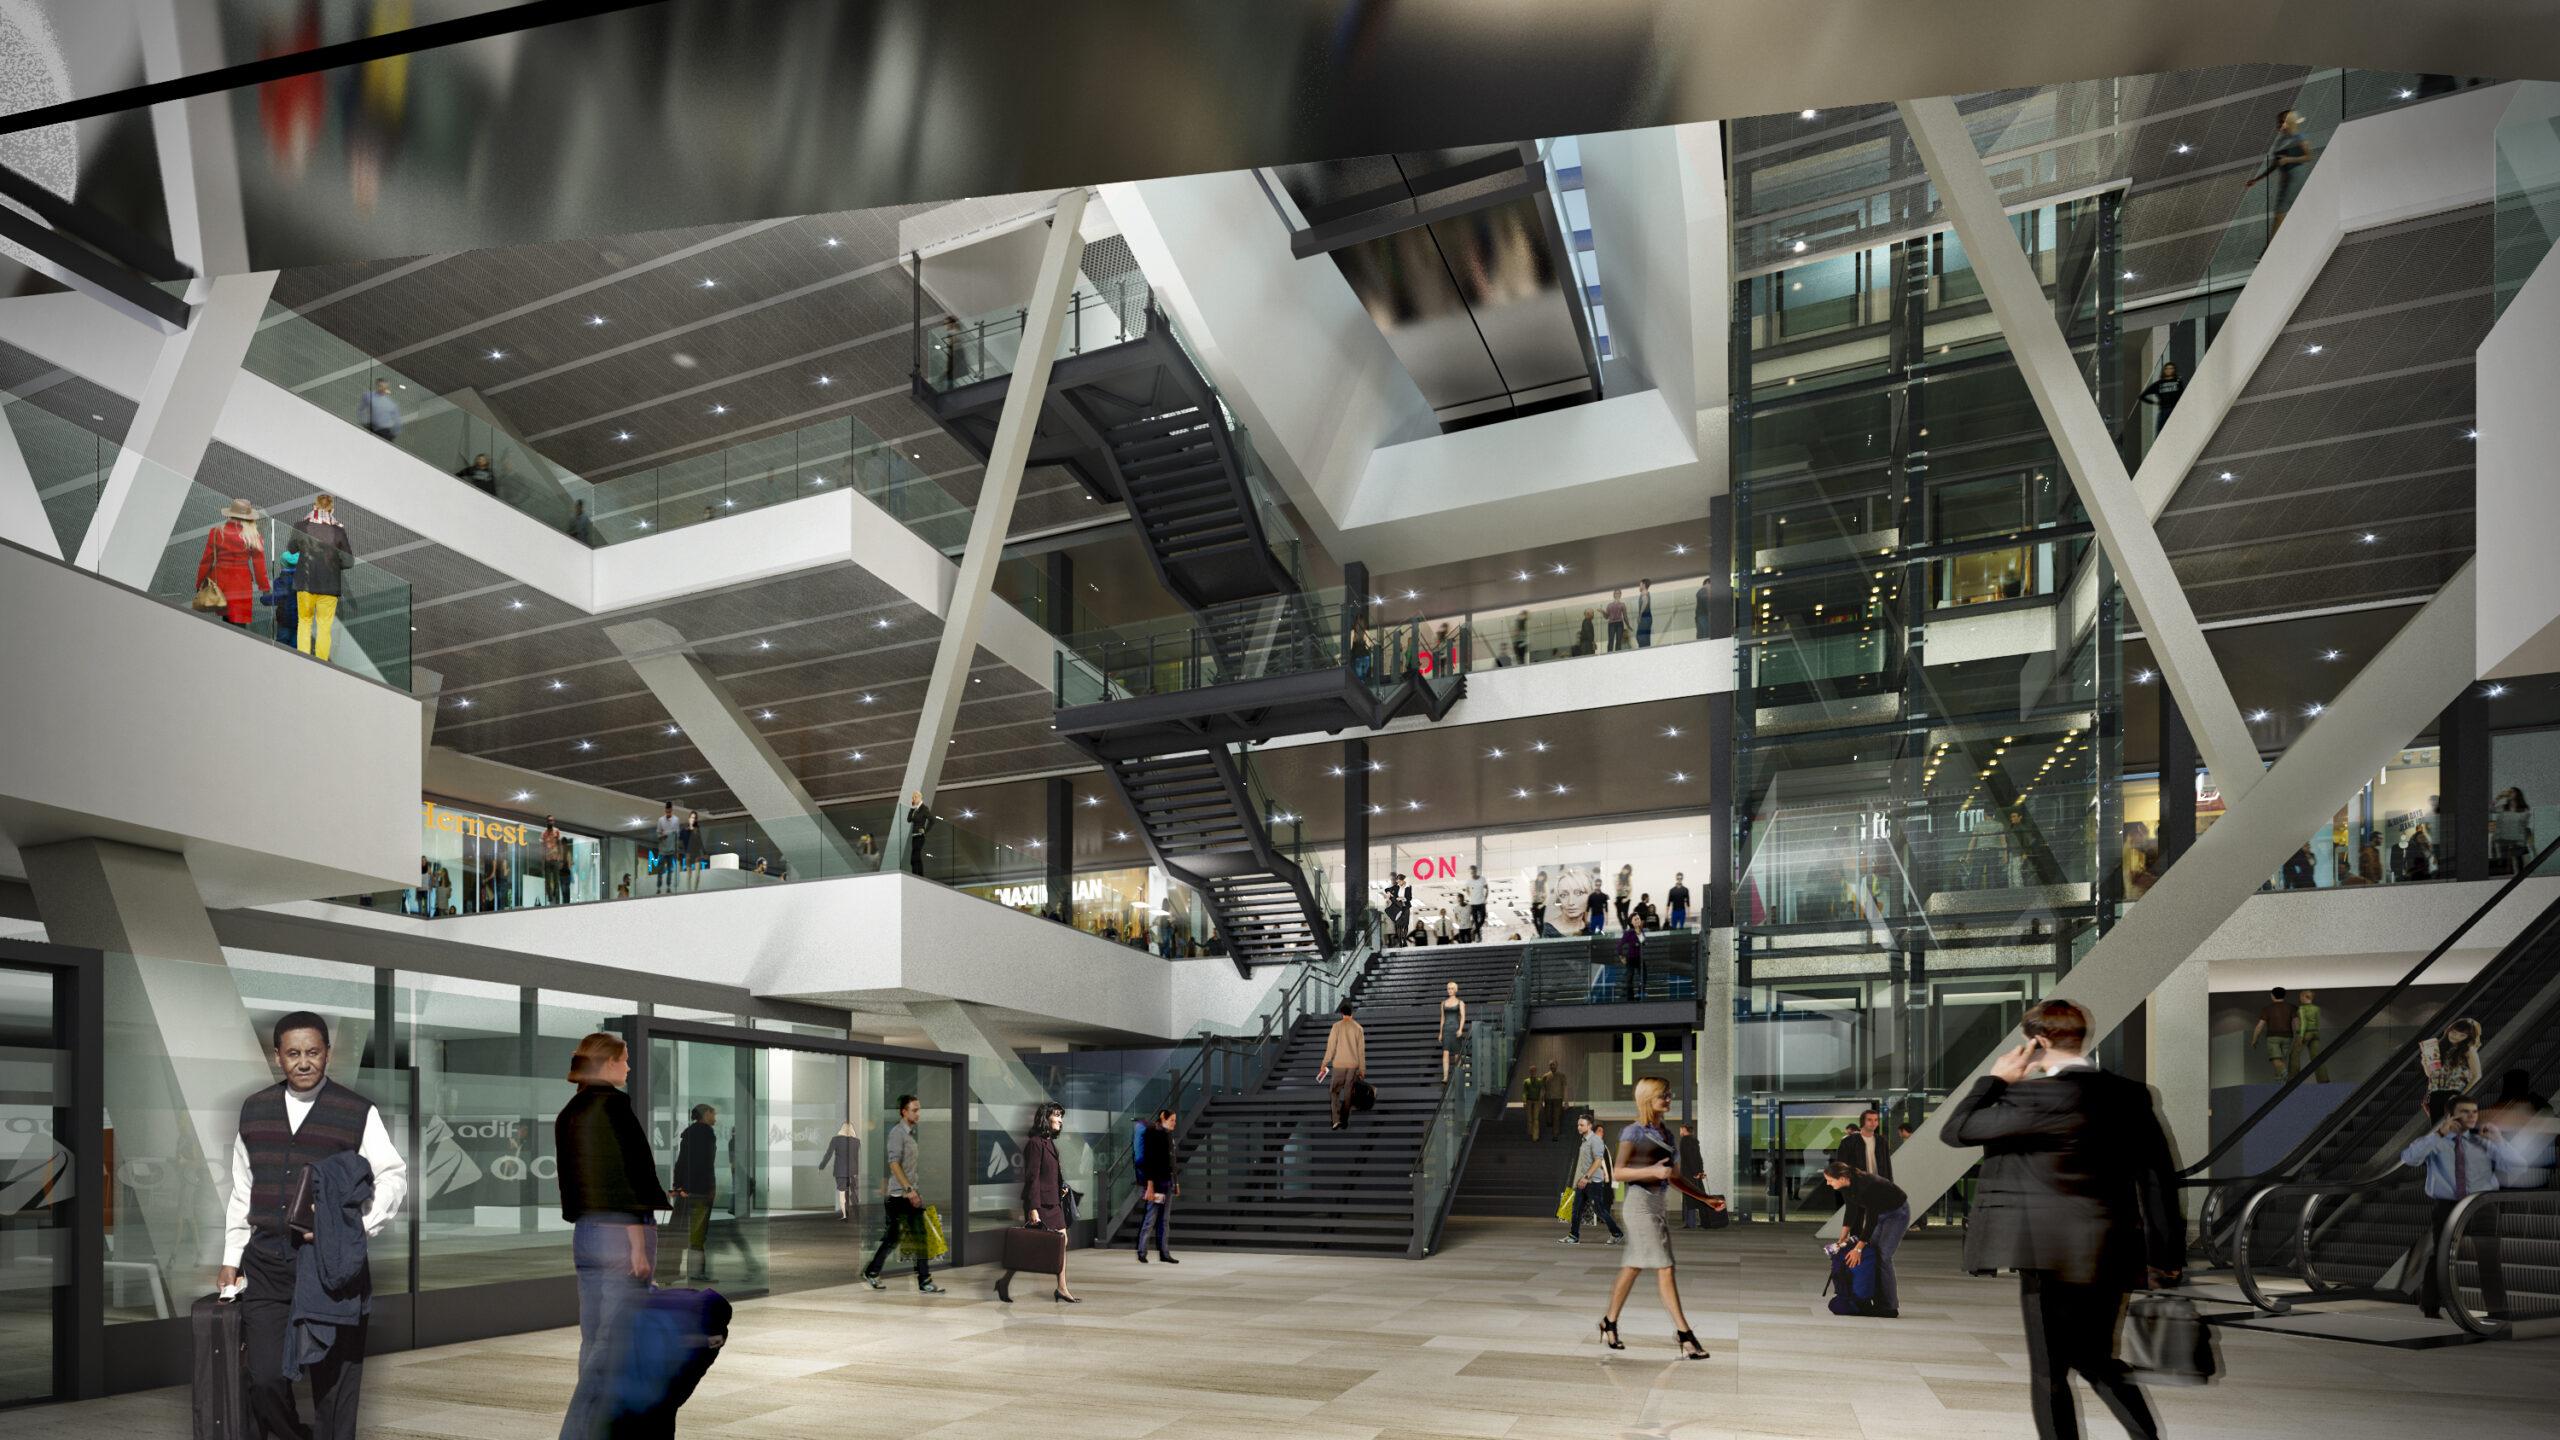 Vialia Vigo, primer centro comercial en disponer de geolocalización en interiores